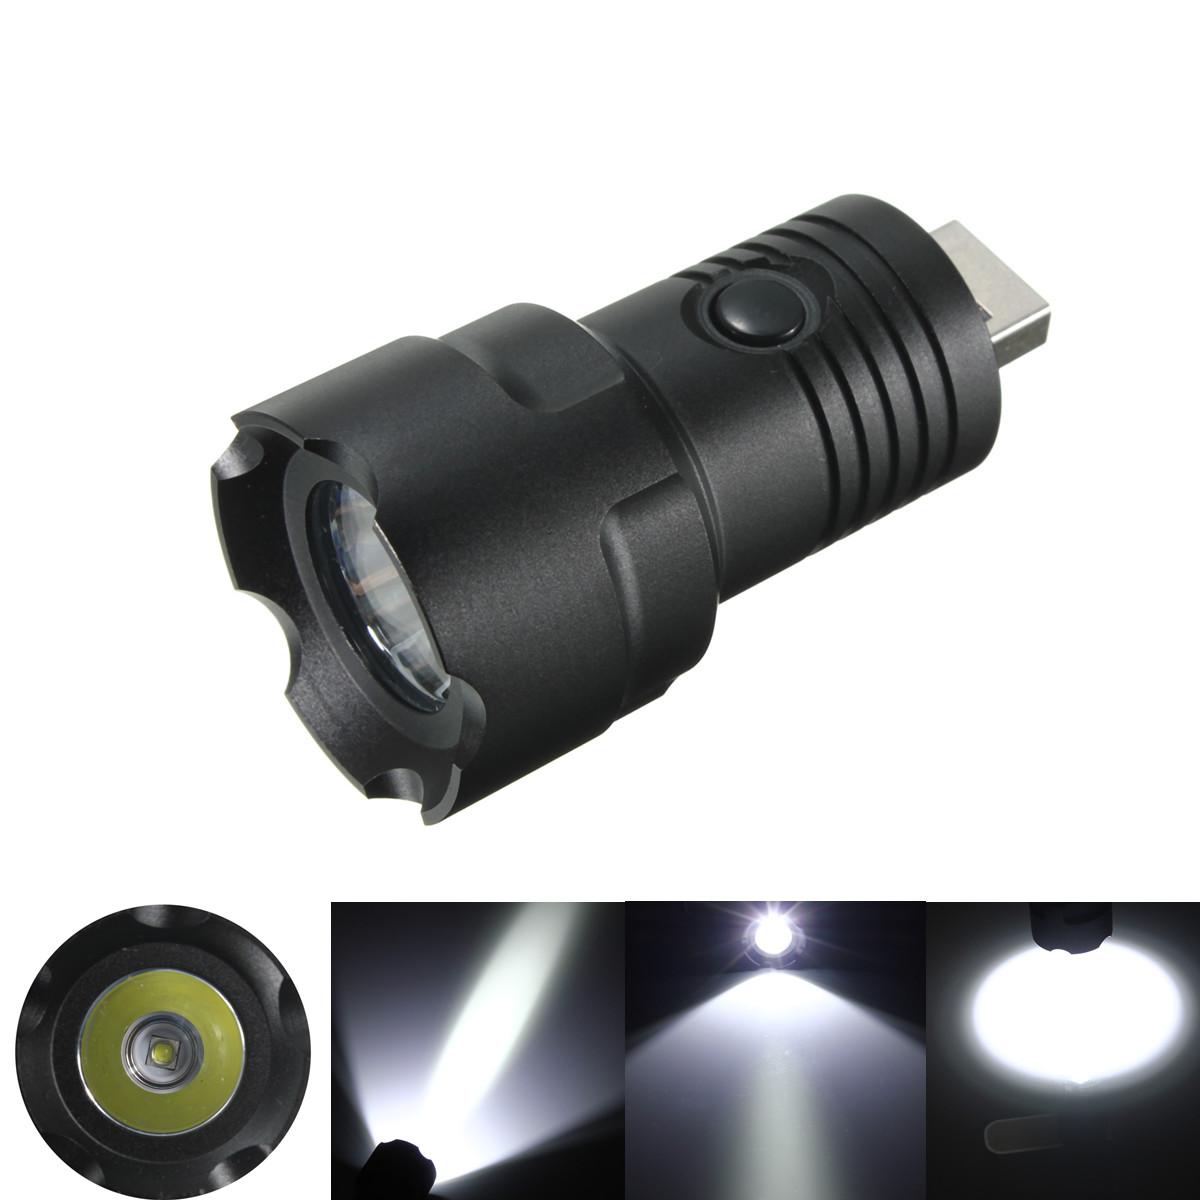 Hot 2000Lm CREE R5 LED USB Light 4 Modes Flashlight Torch ...